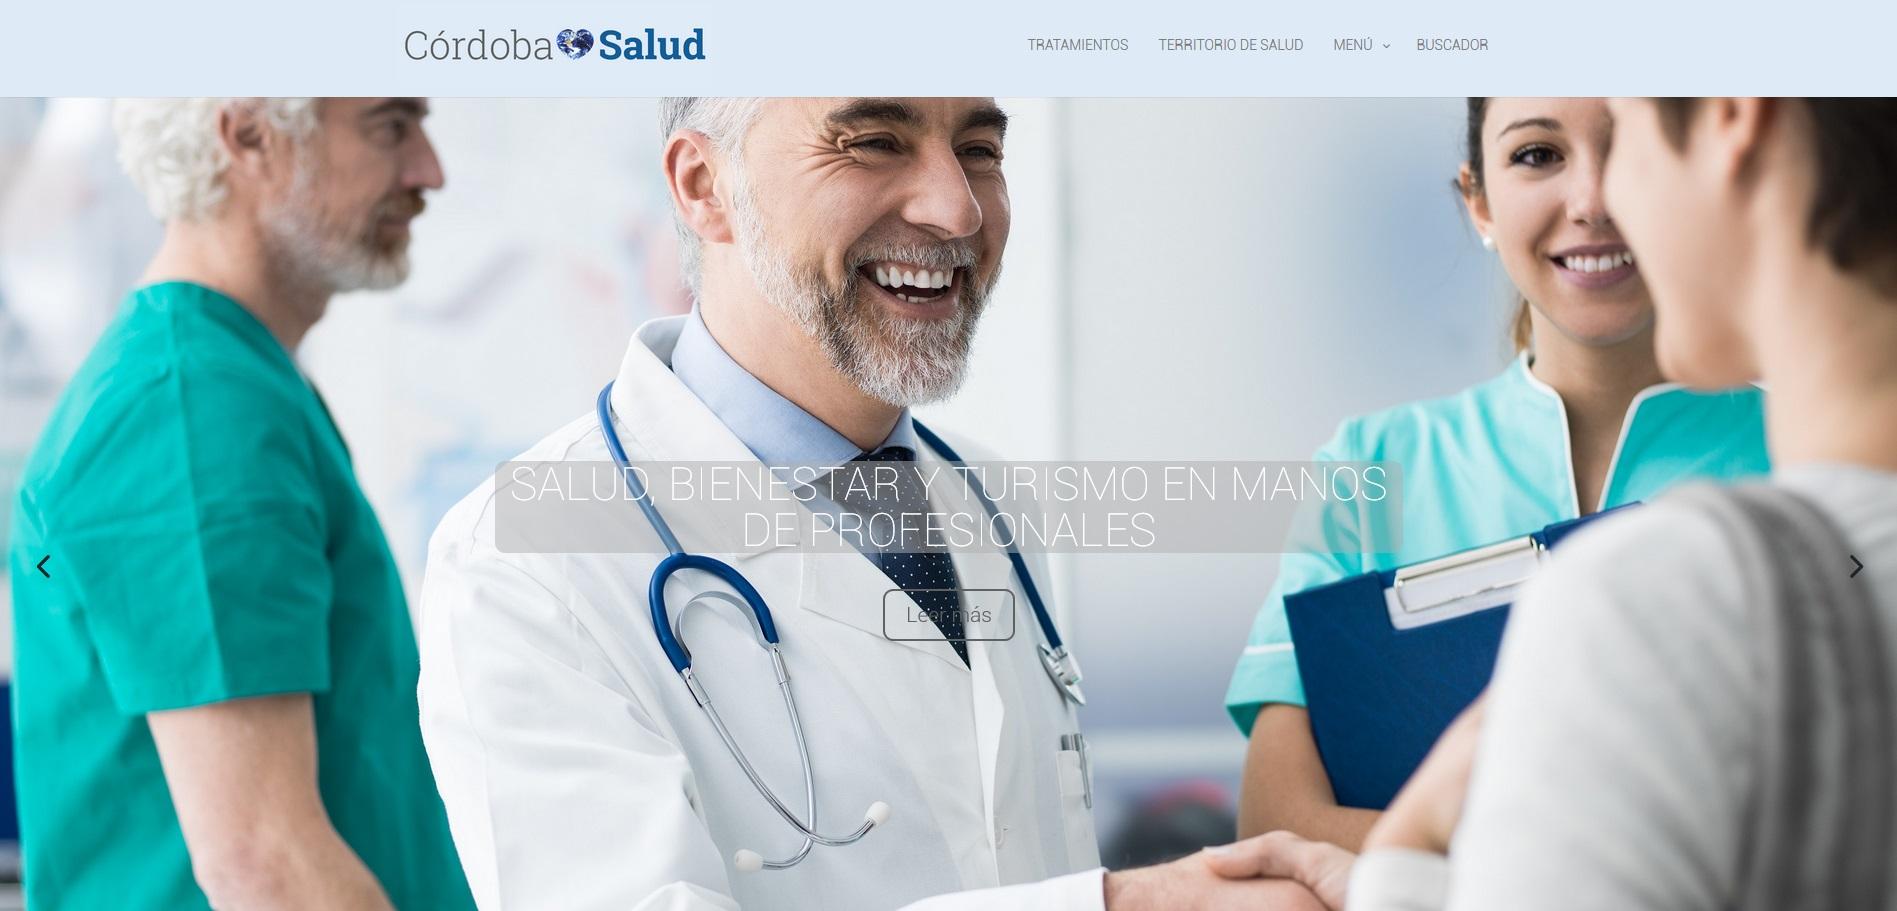 Córdoba Mundo Salud